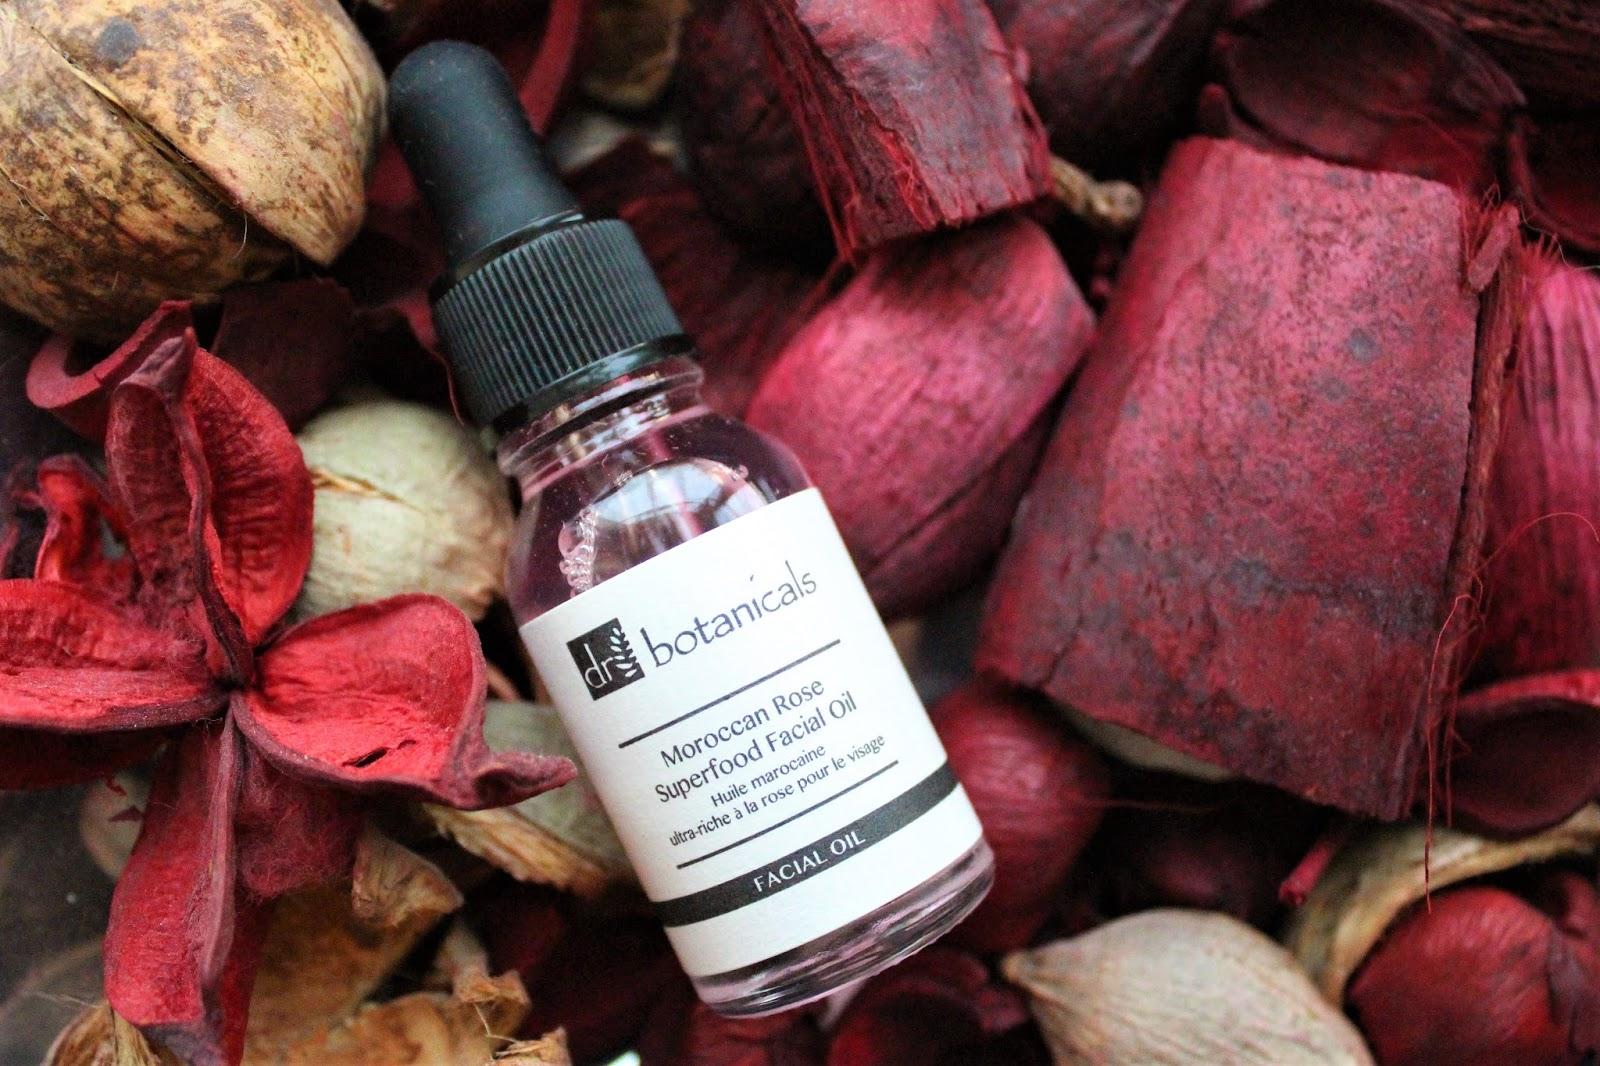 dr botanicals moroccan rose facial oil